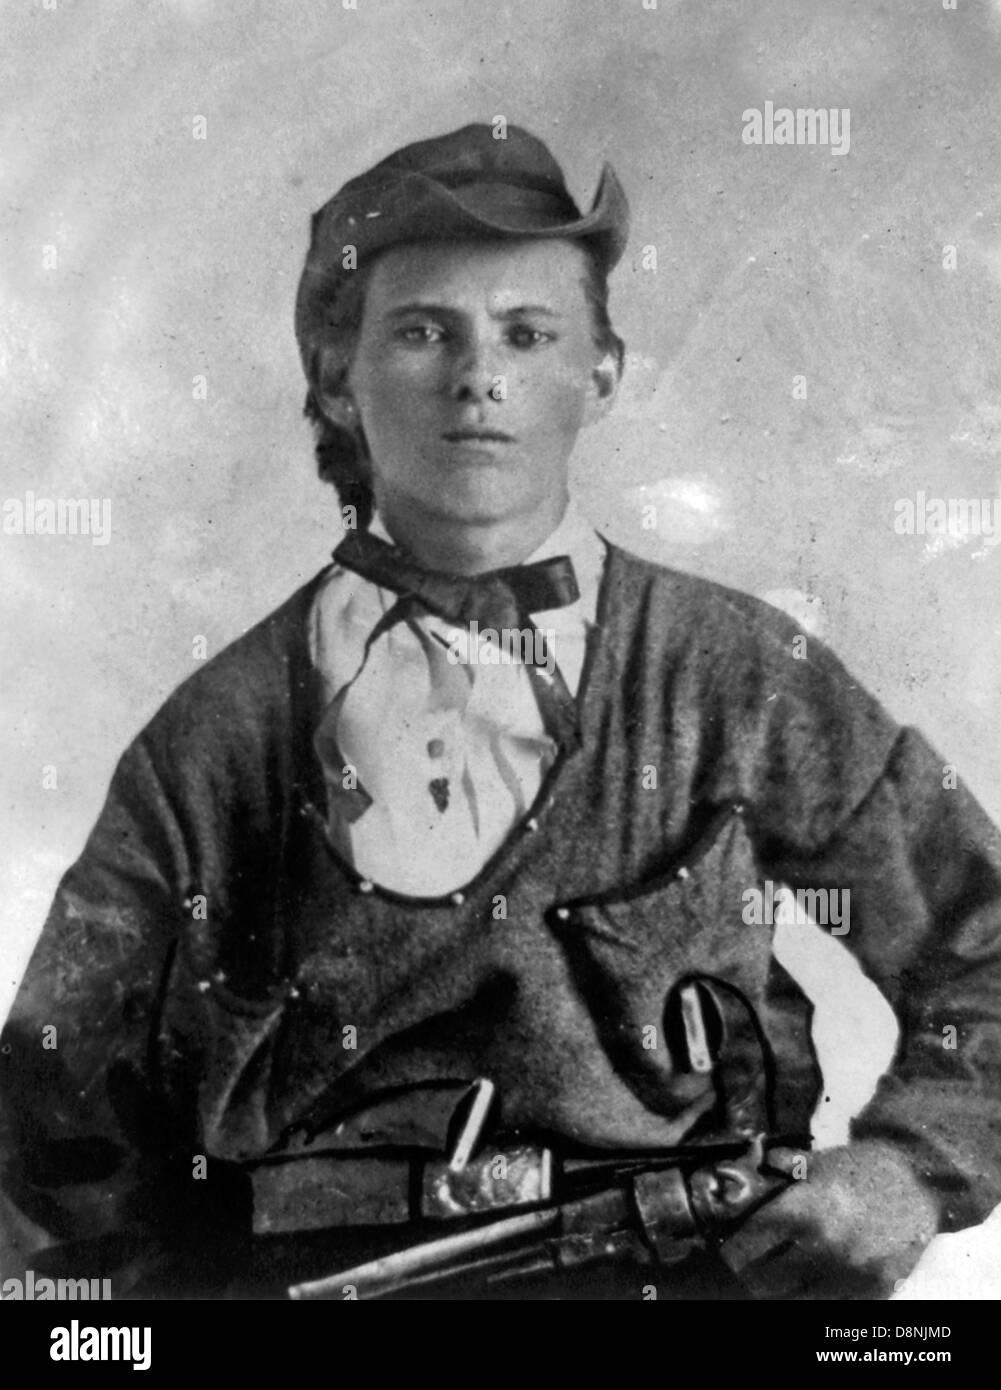 Jesse James als junger Mann Stockbild